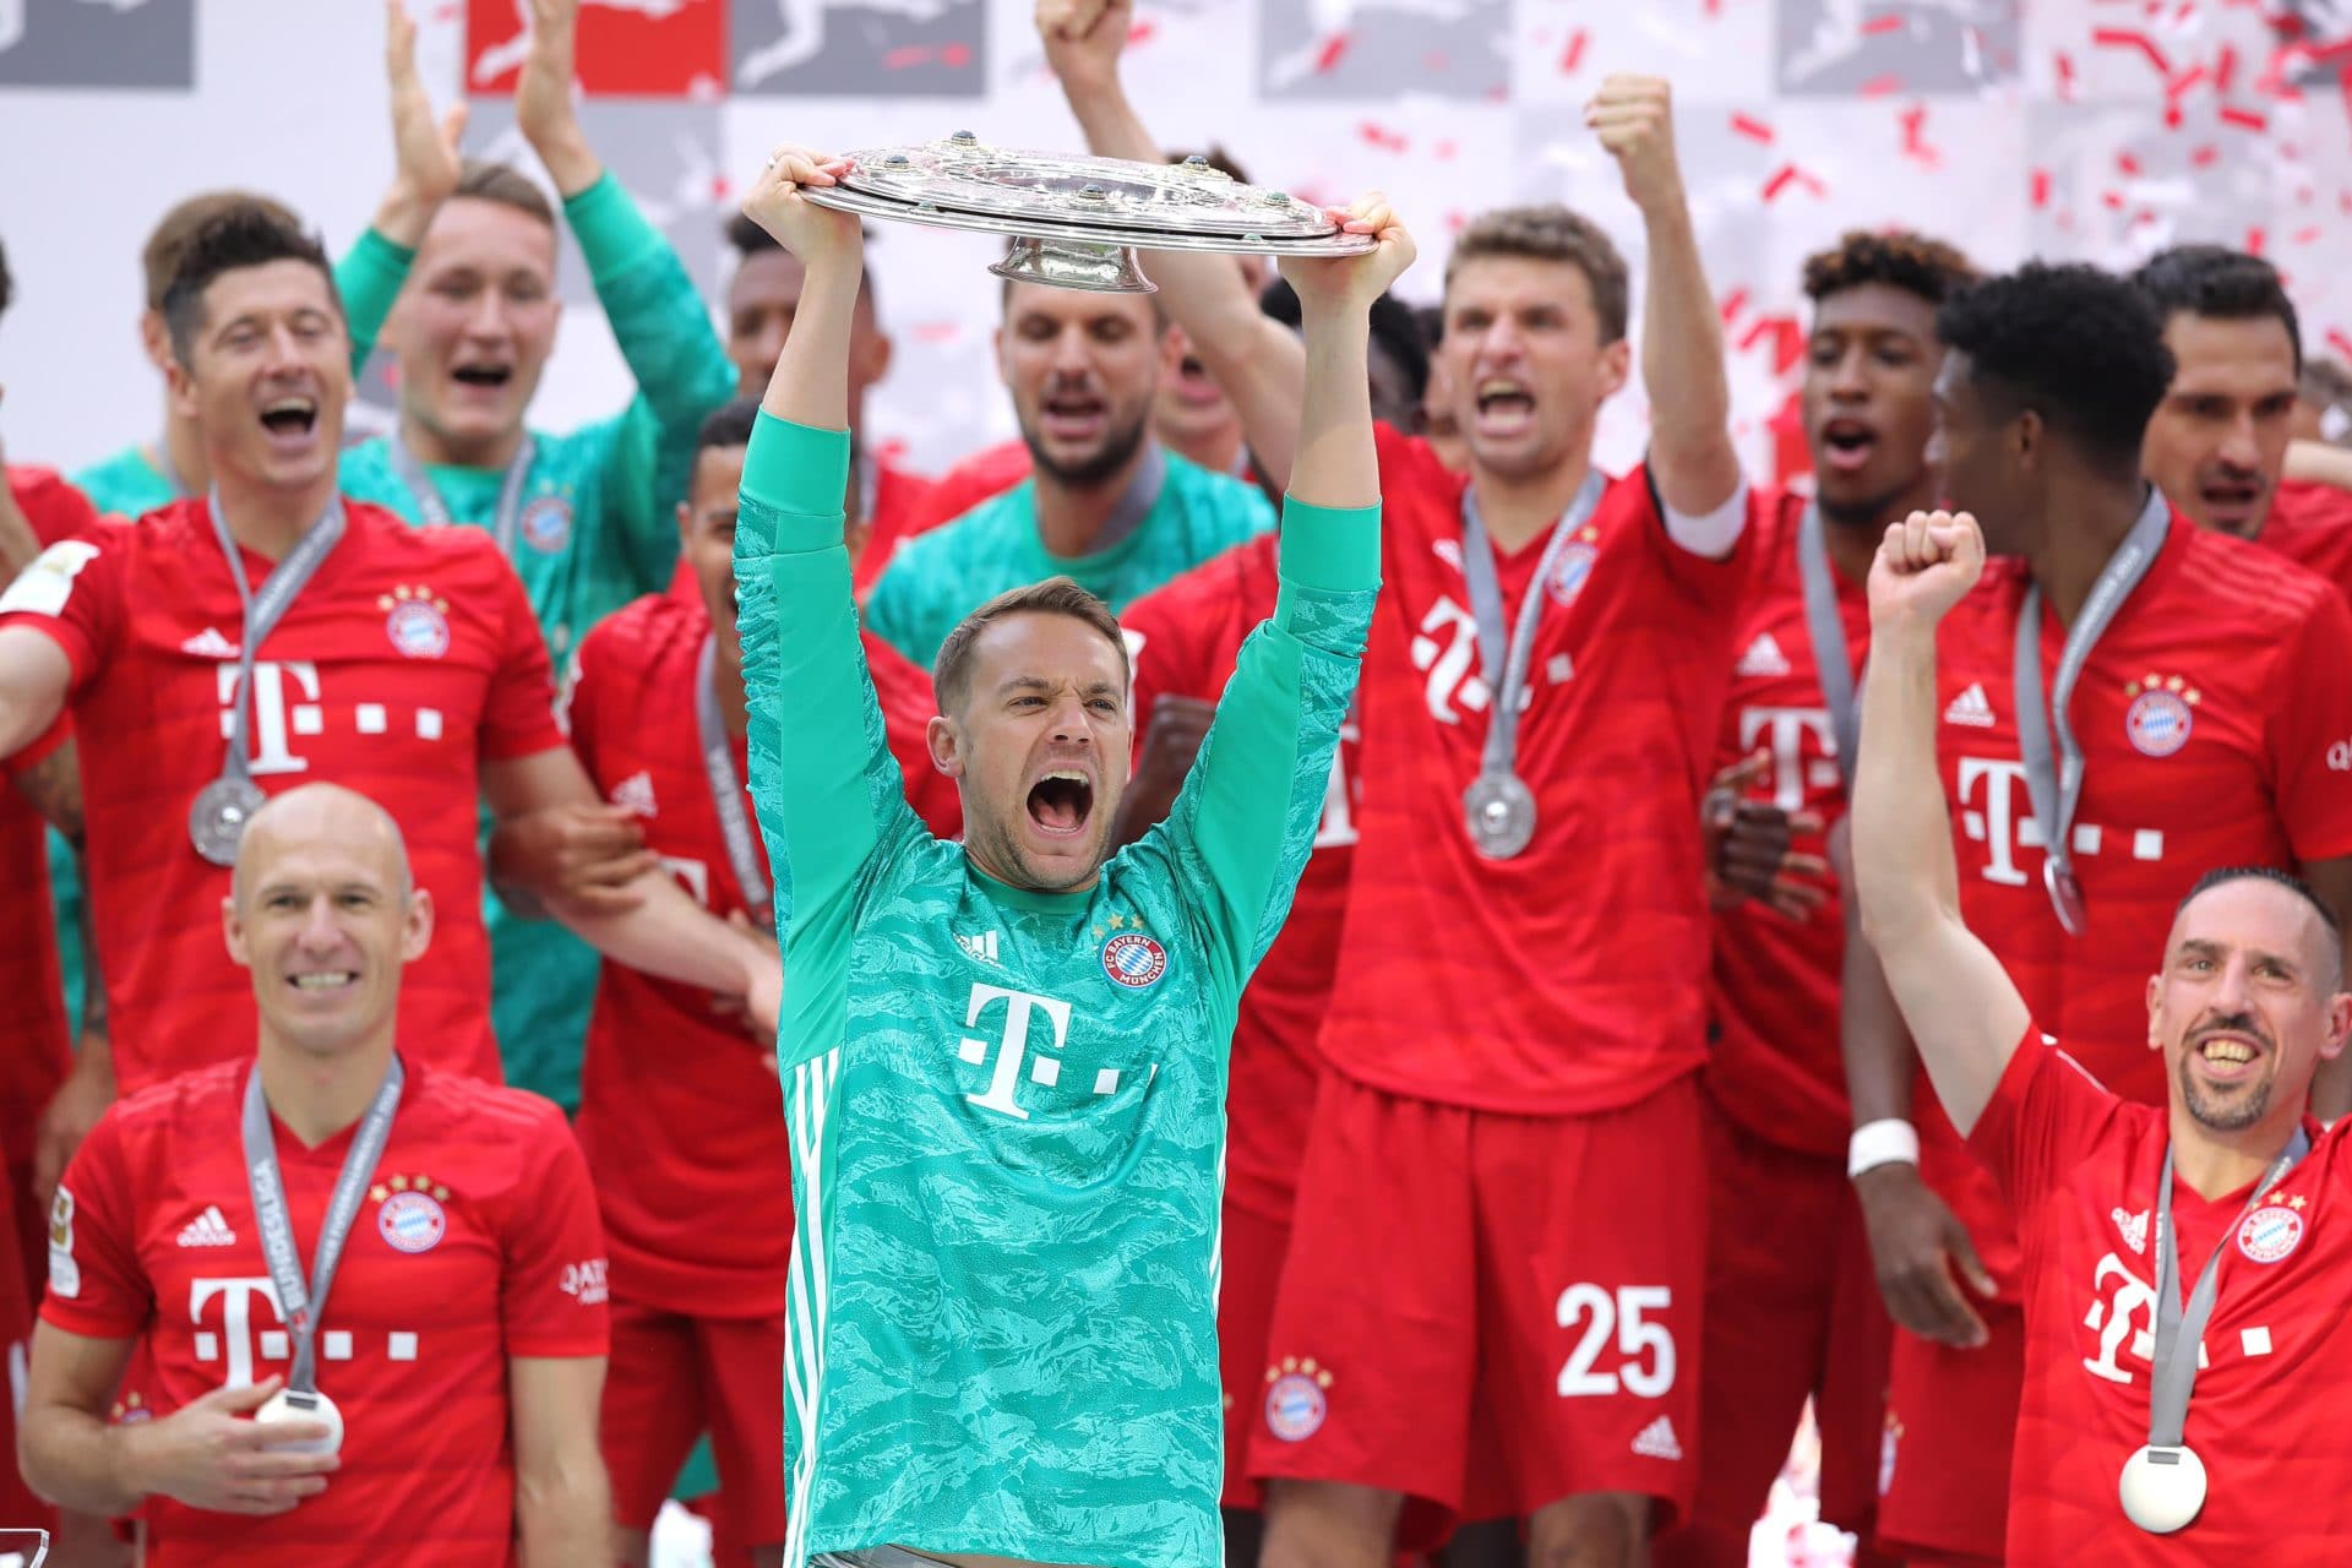 Bundesliga Calendario.Calendario Bundesliga 2019 2020 Date Inizio E Fine Soste E